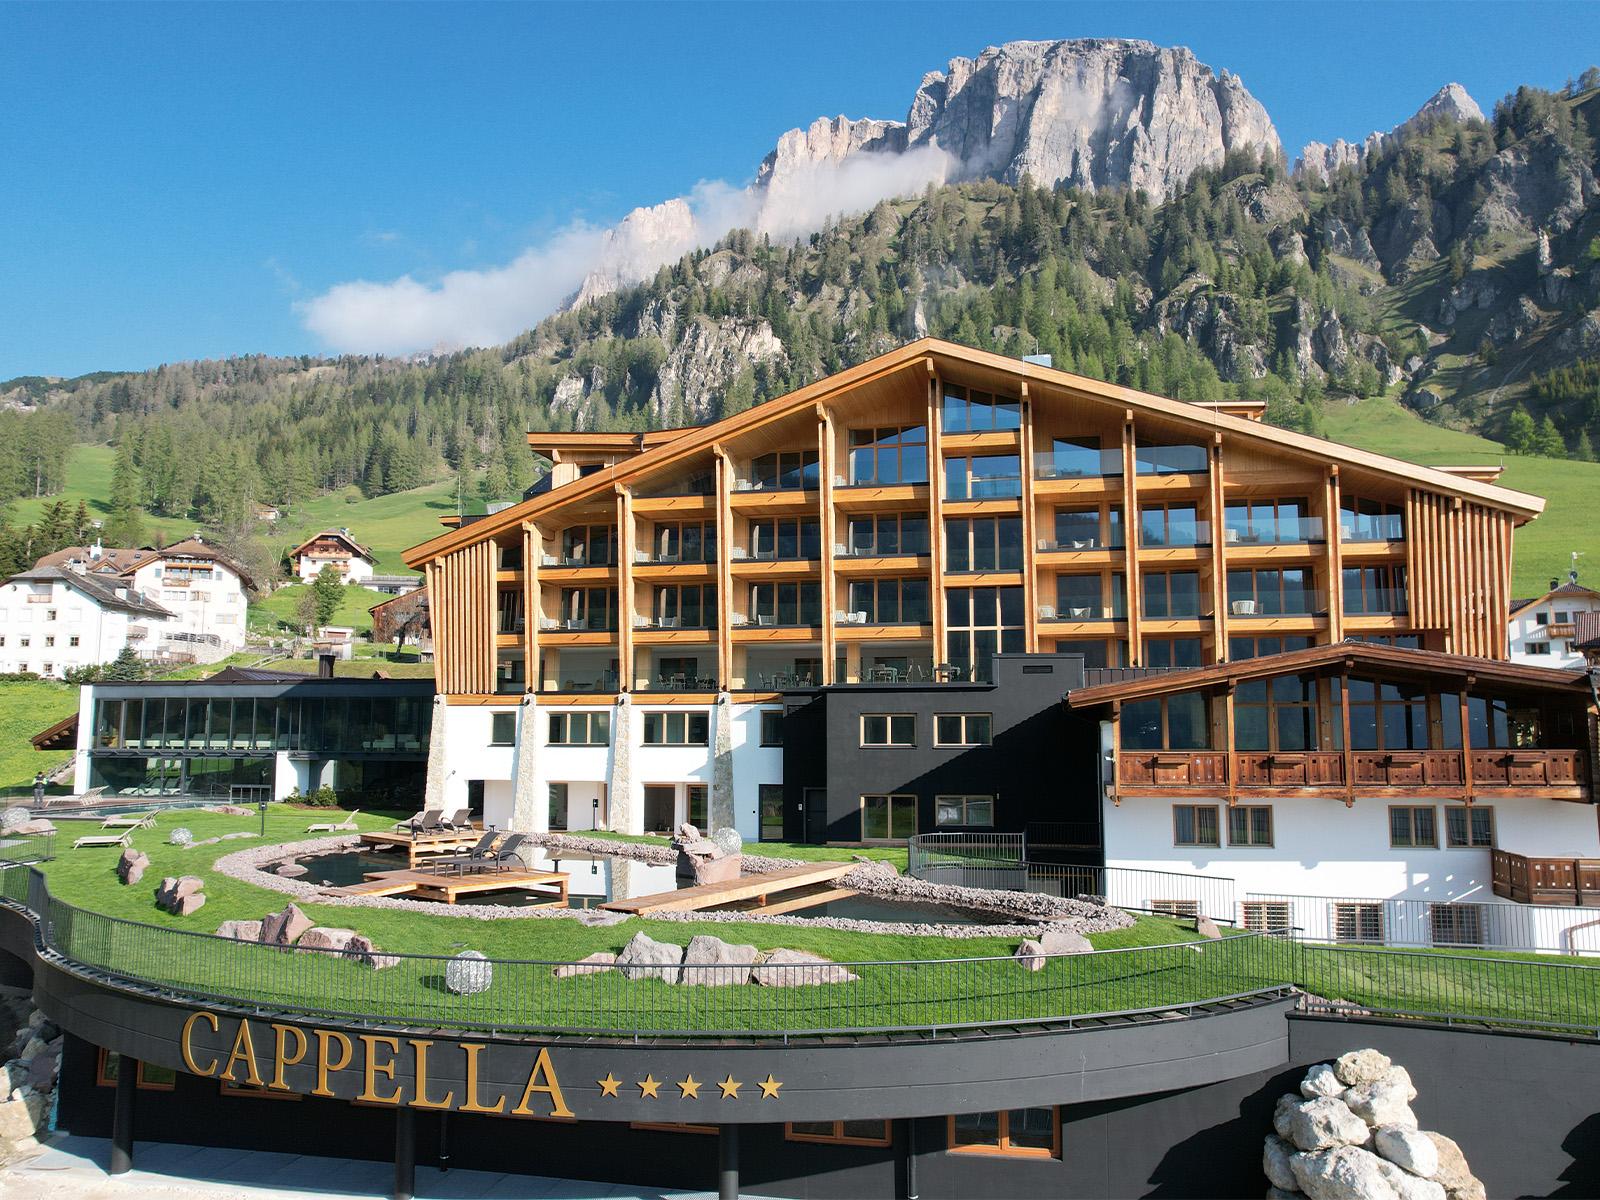 Hotel Cappella in Val Badia